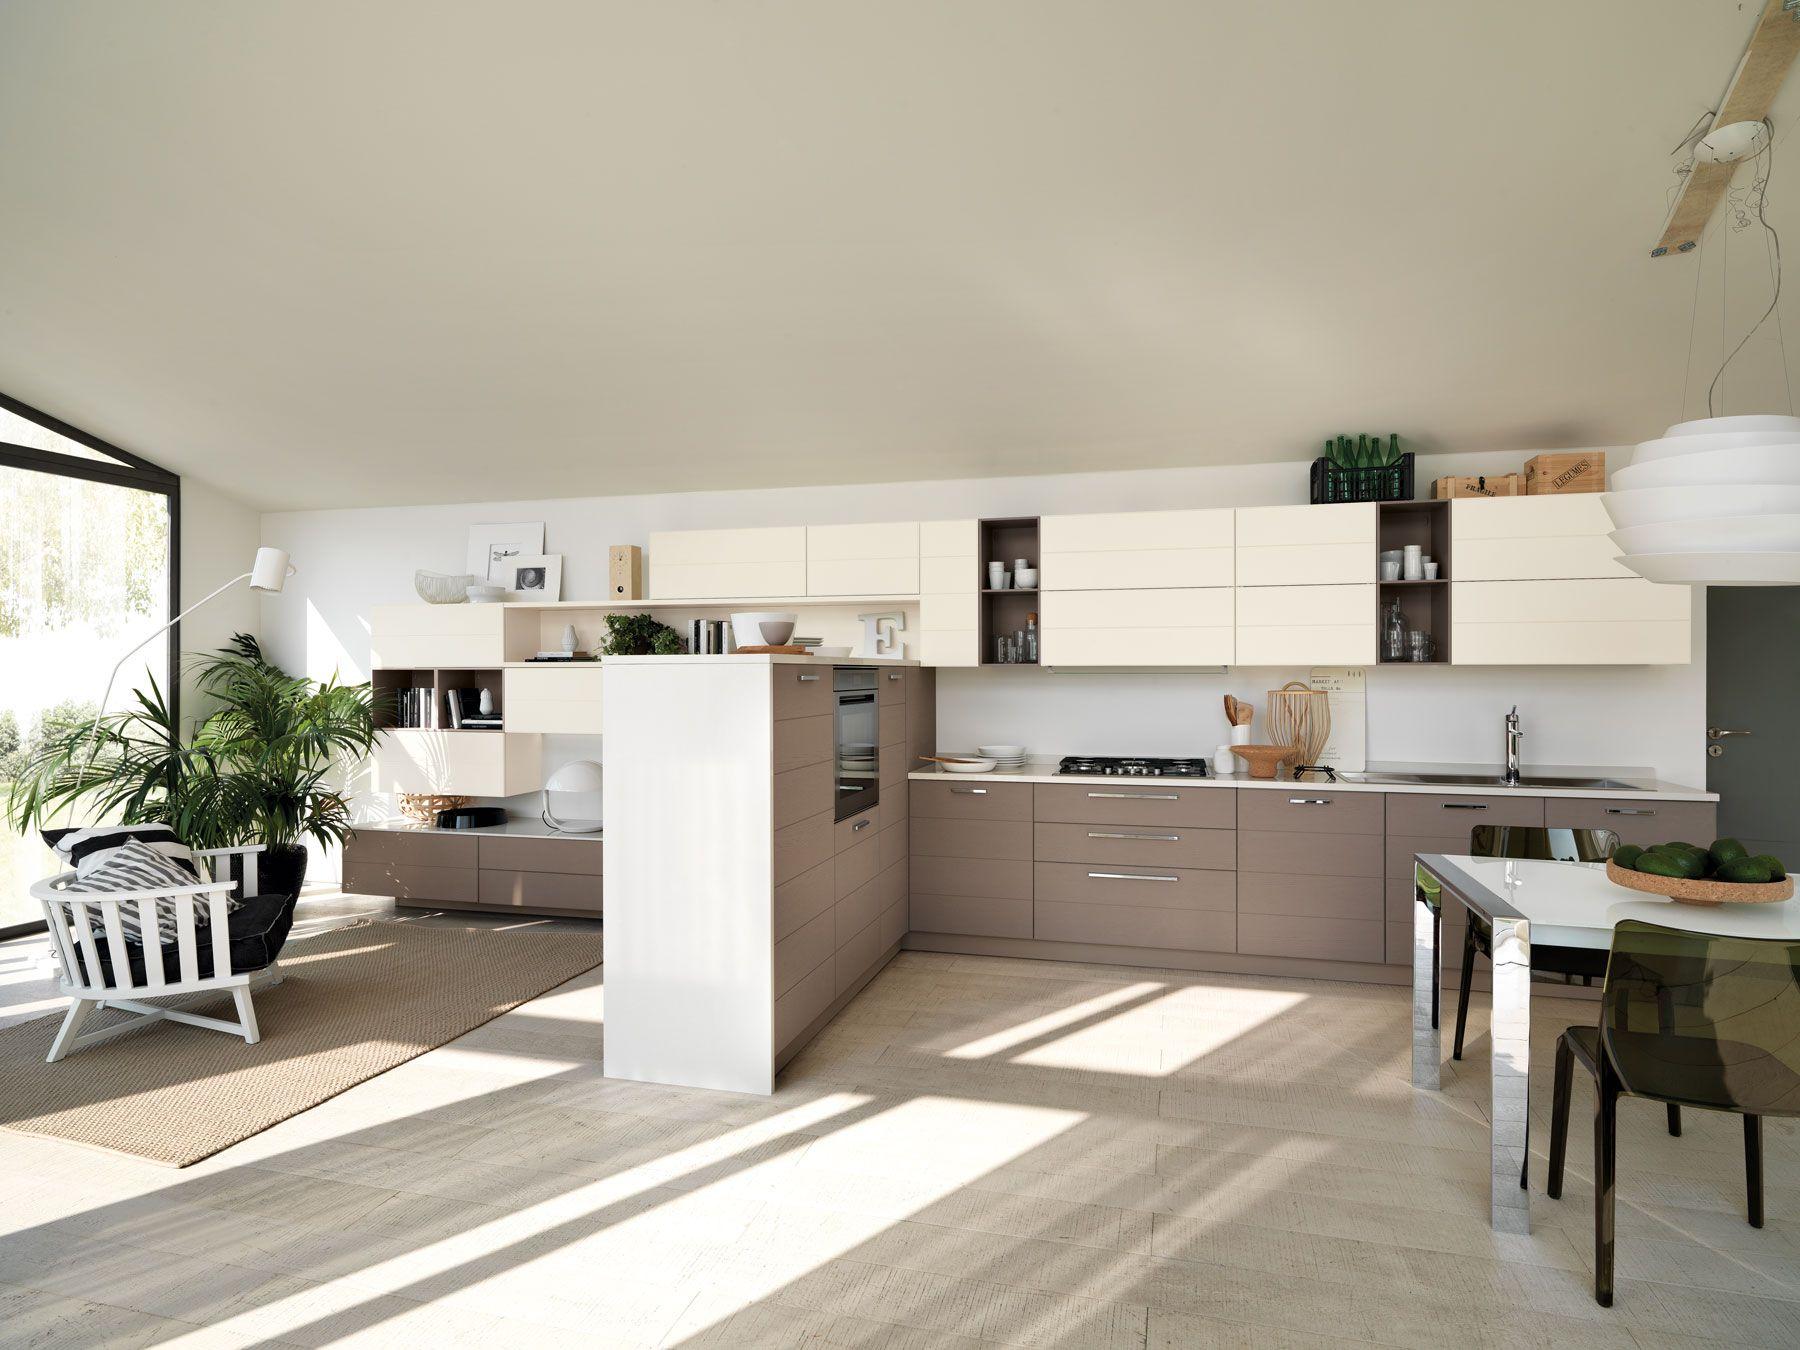 Cucina e living – Home ricette segreti culinari